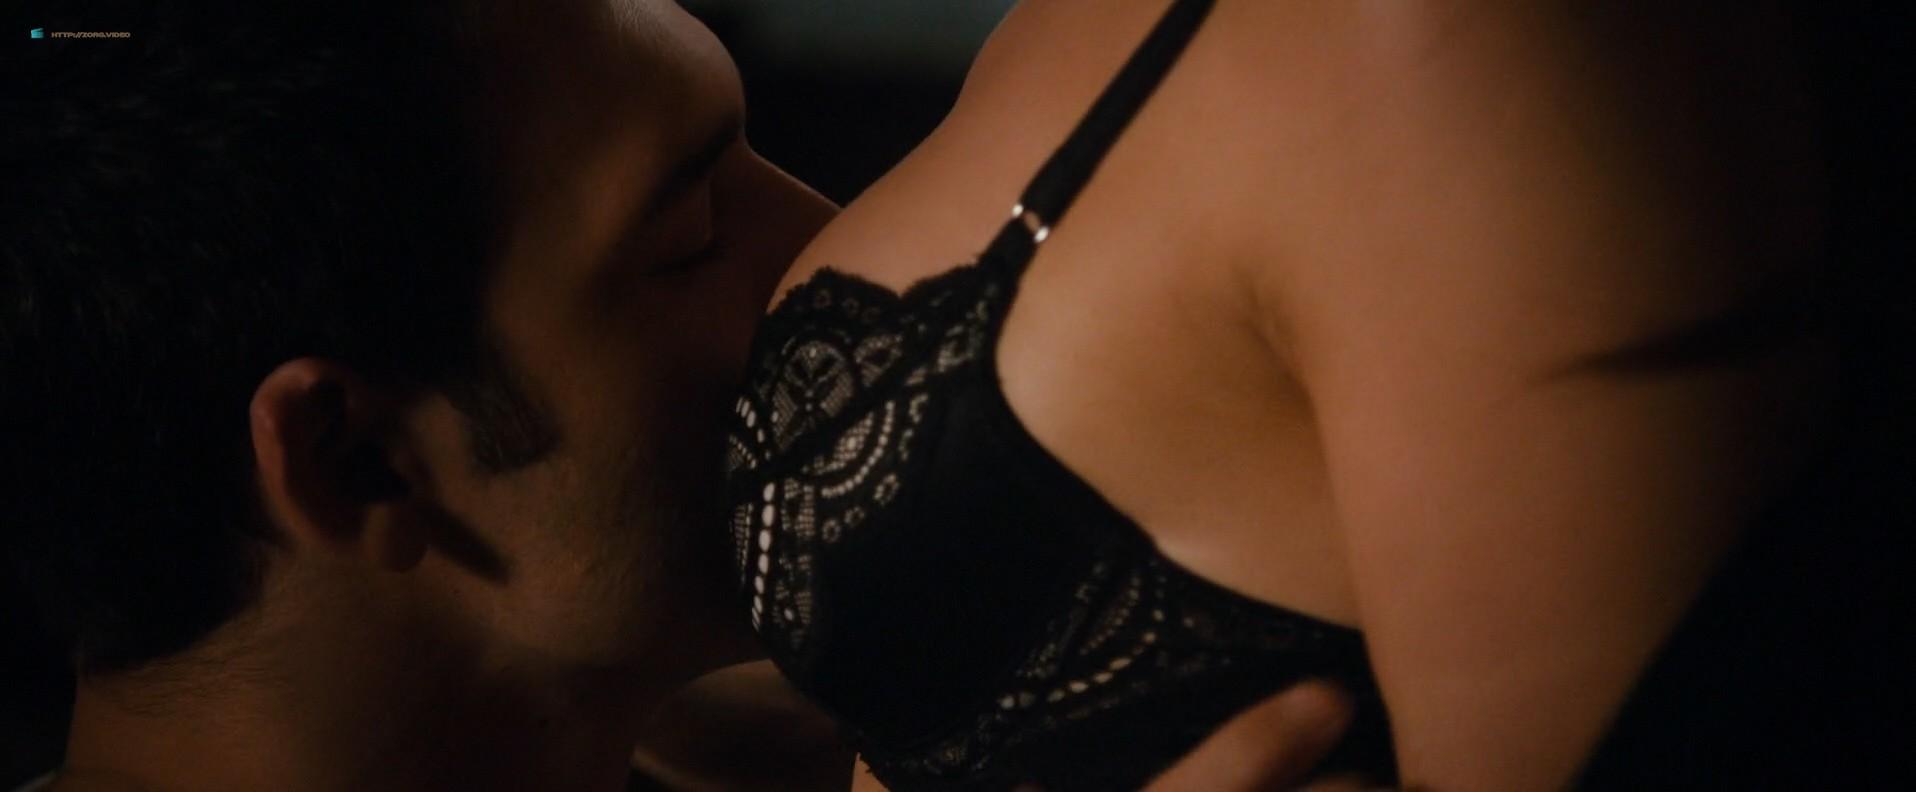 Jennifer Lopez hot sex scene and Lexi Atkins nude sex - The Boy Next Door (2015) HD 1080p (12)